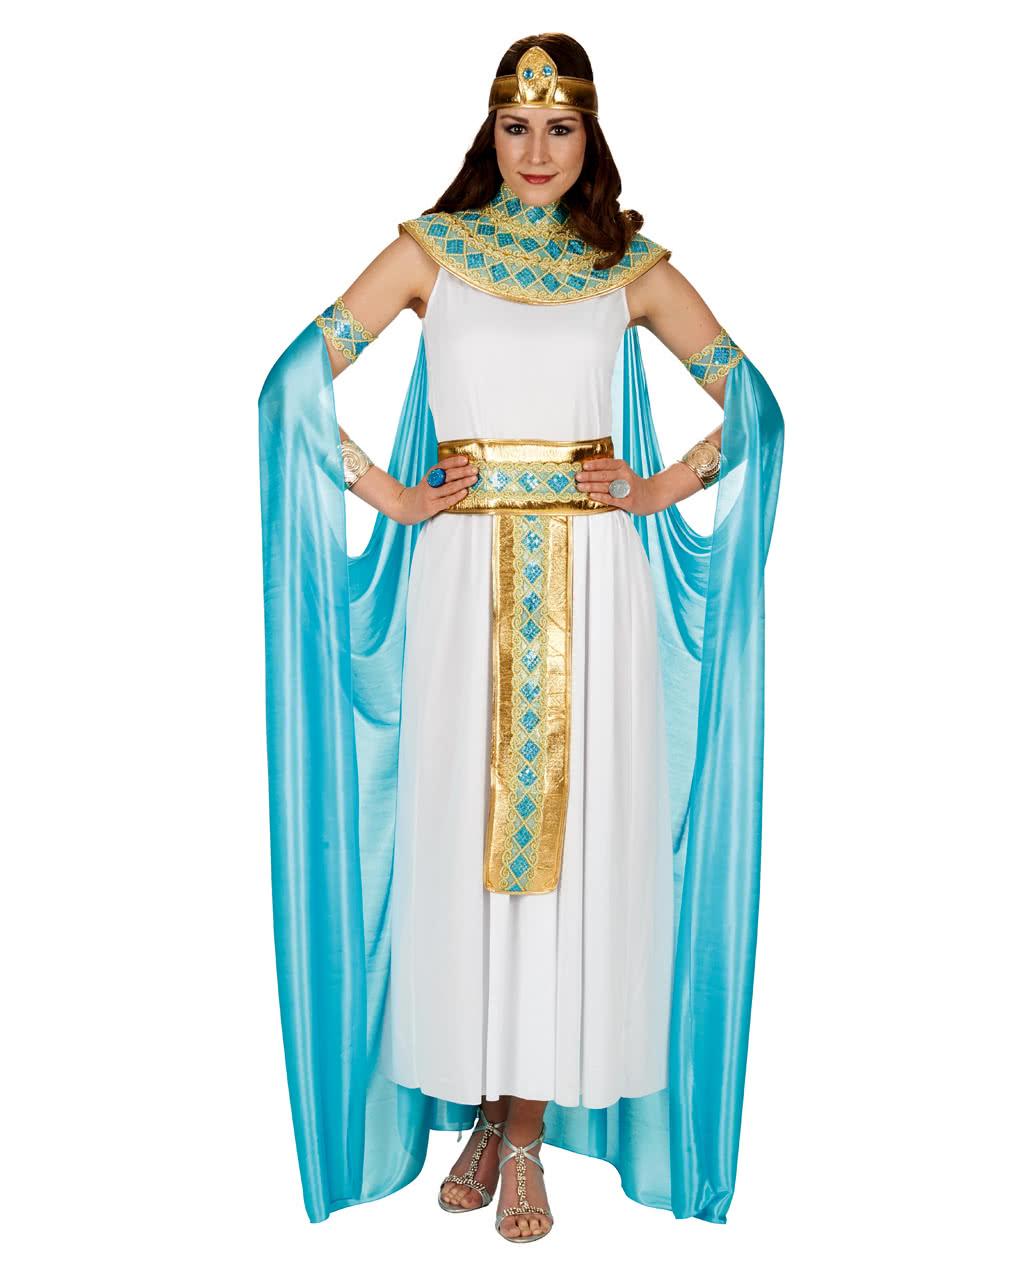 Damenkostum Cleopatra Mit Cape Als Faschingskostum Karneval Universe